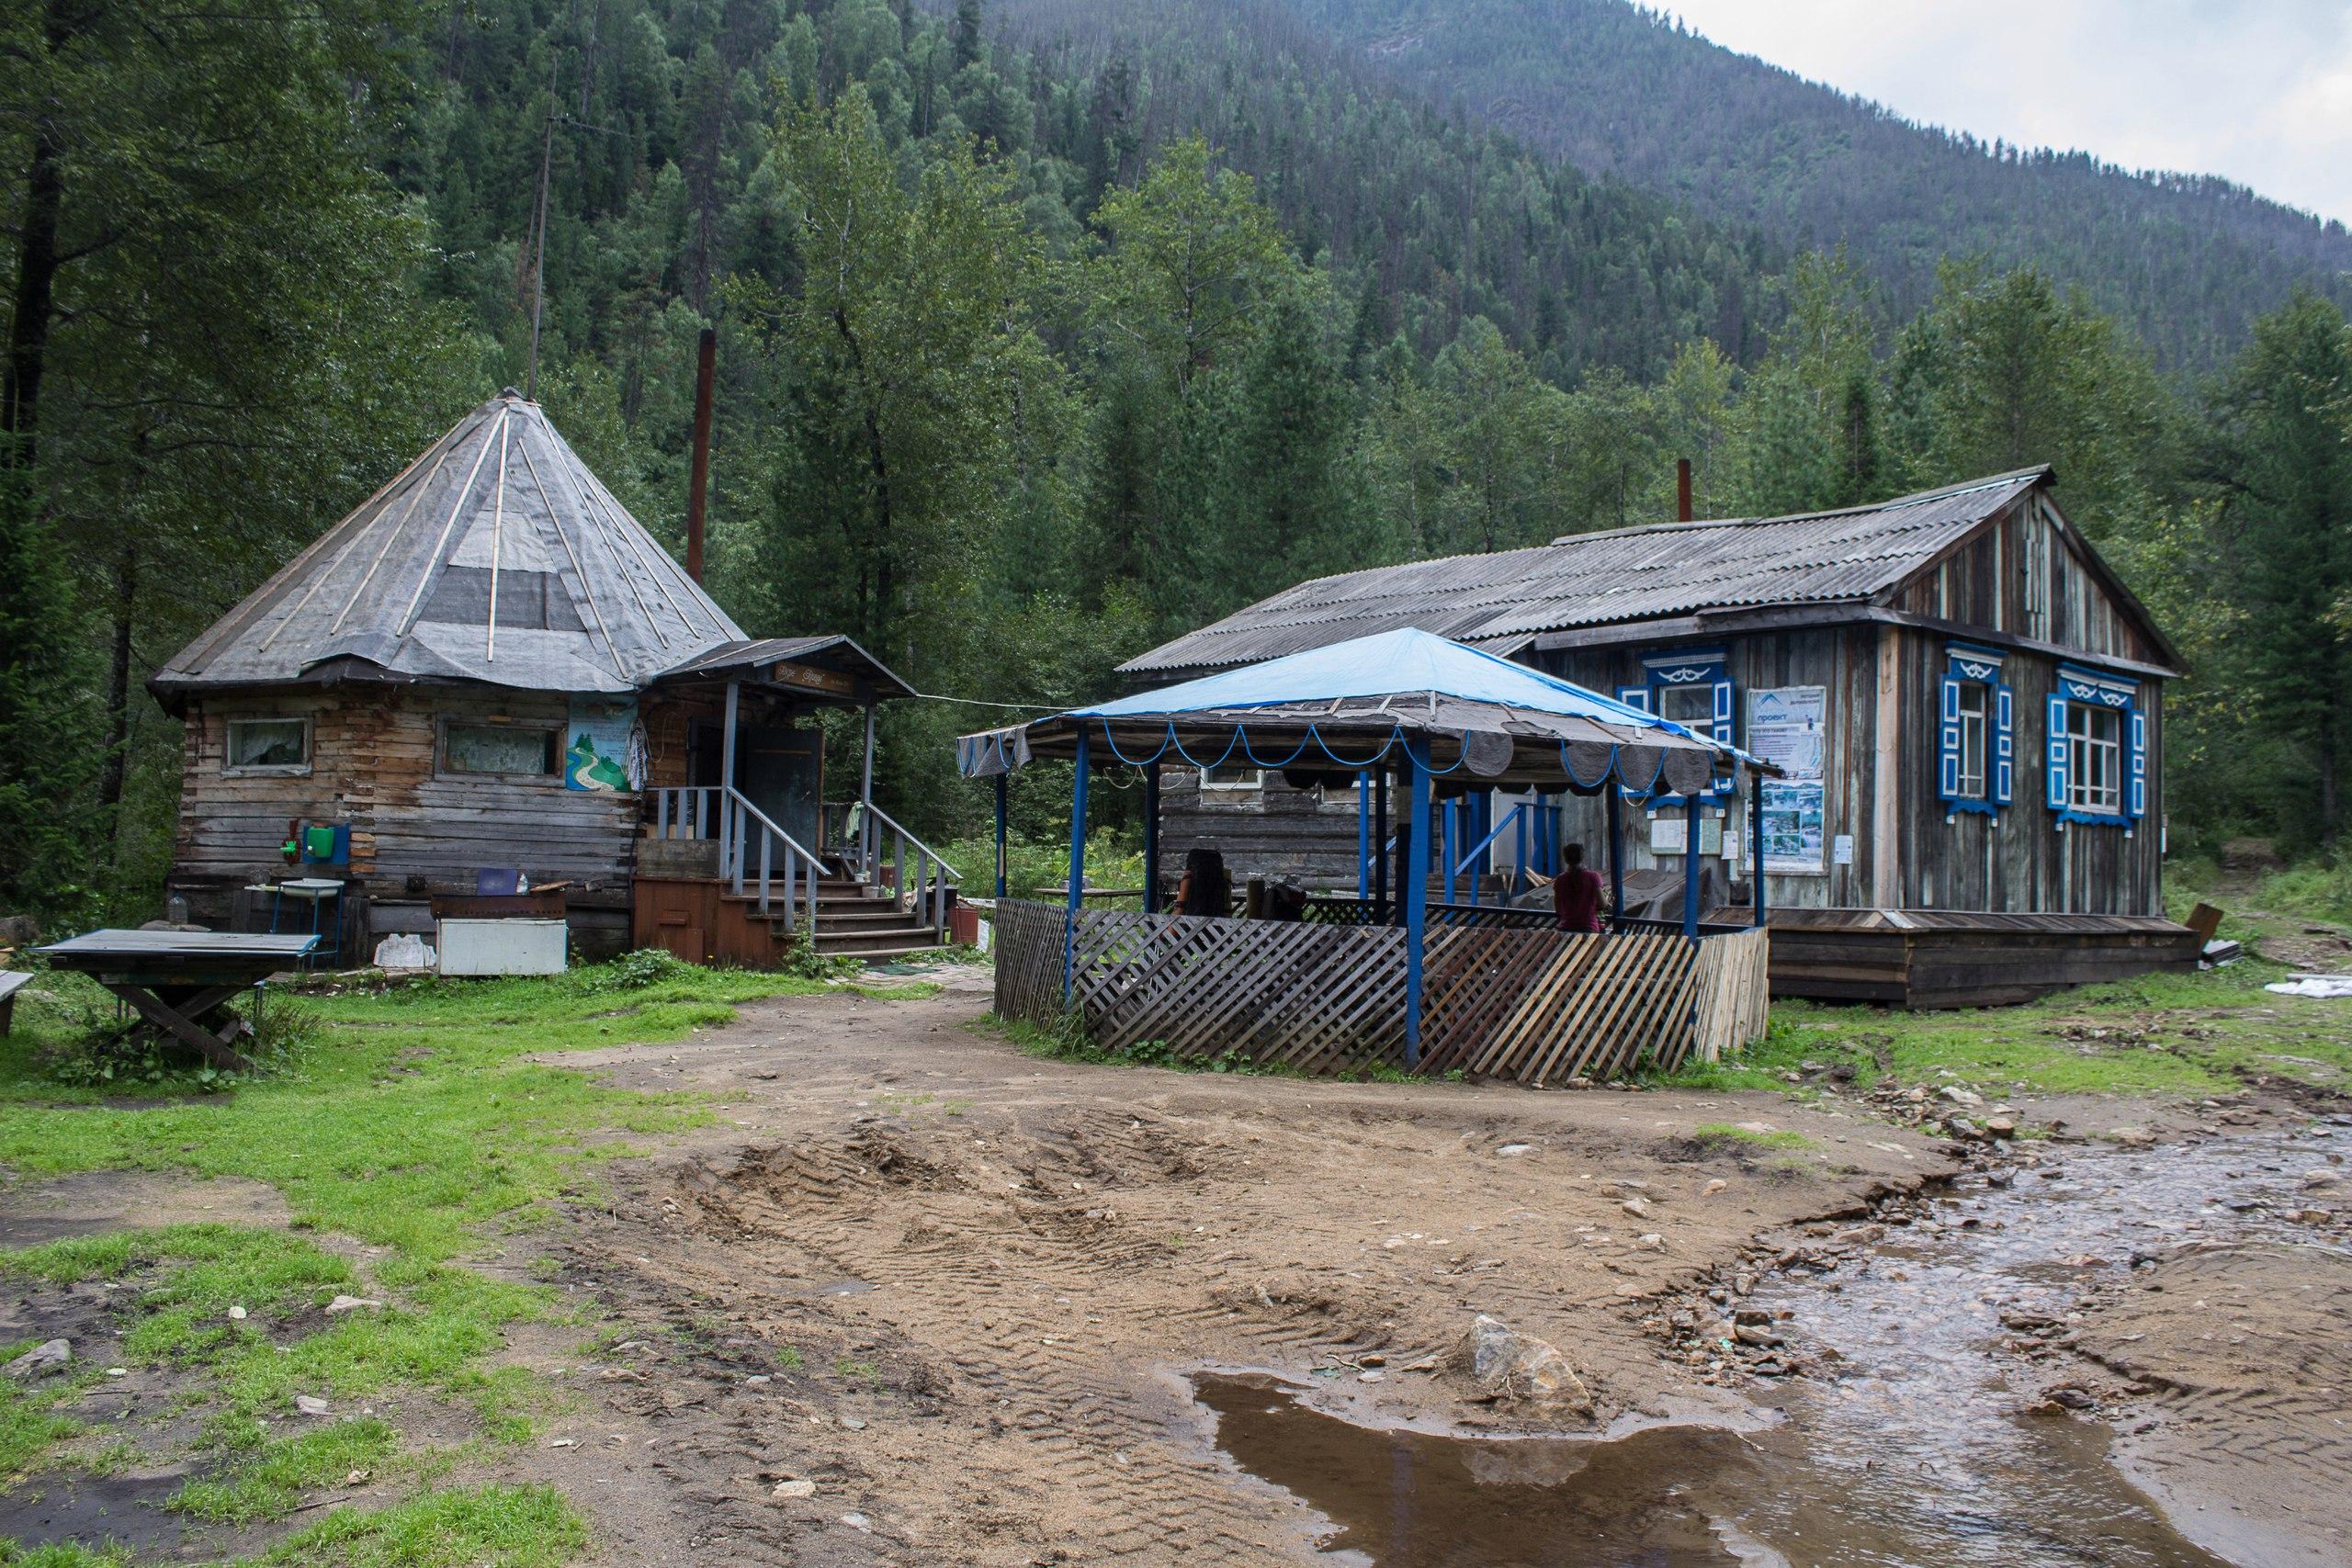 кафе и другие постройки